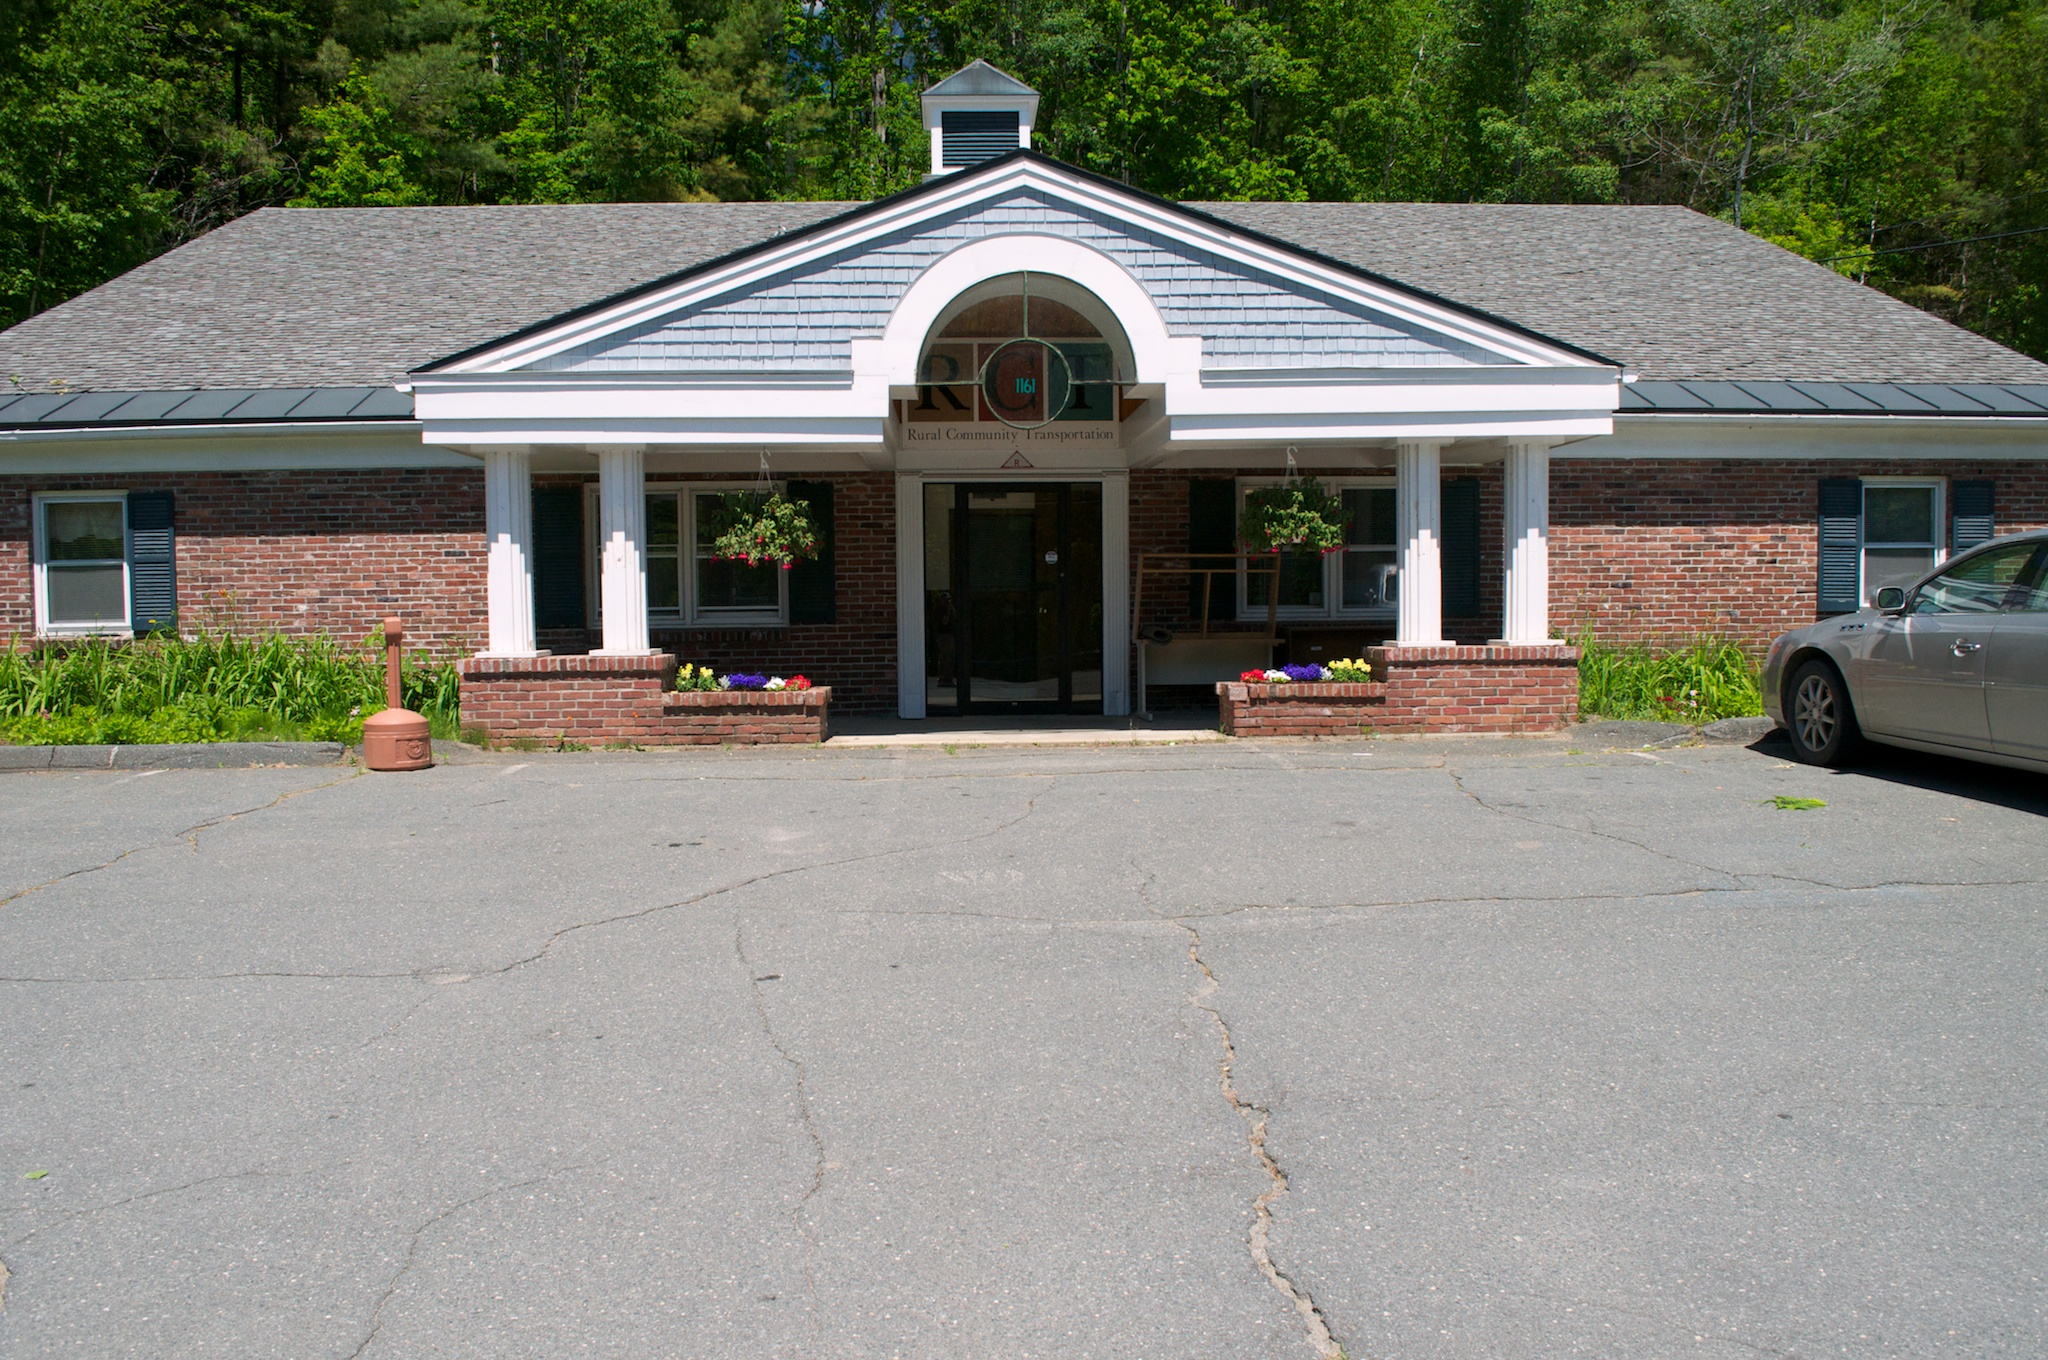 Rural Community Transit